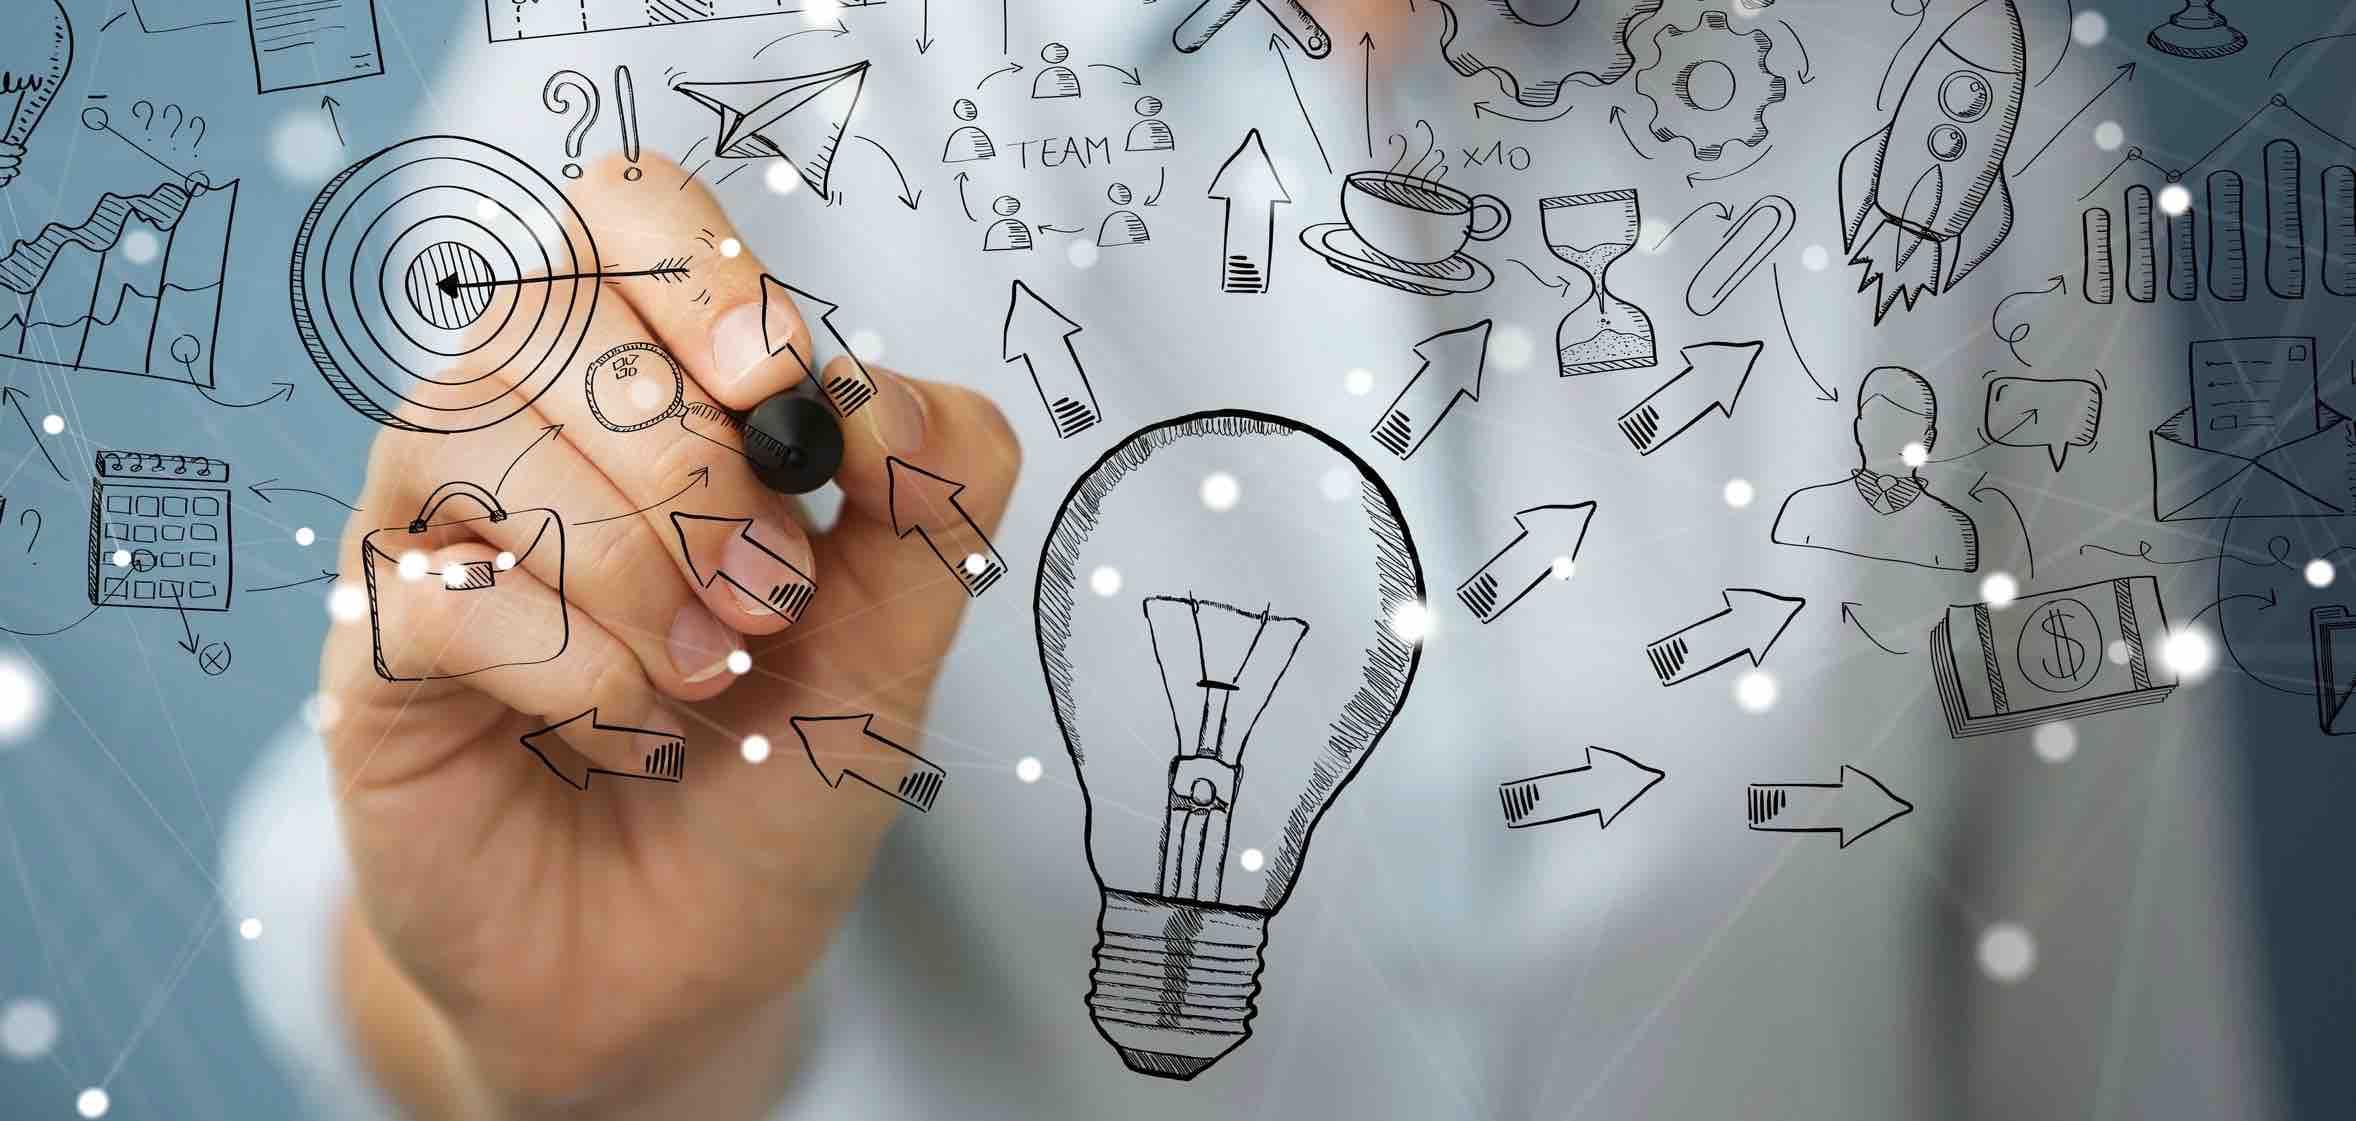 Das Richtige entwickeln: Pretotyping vor Prototyping